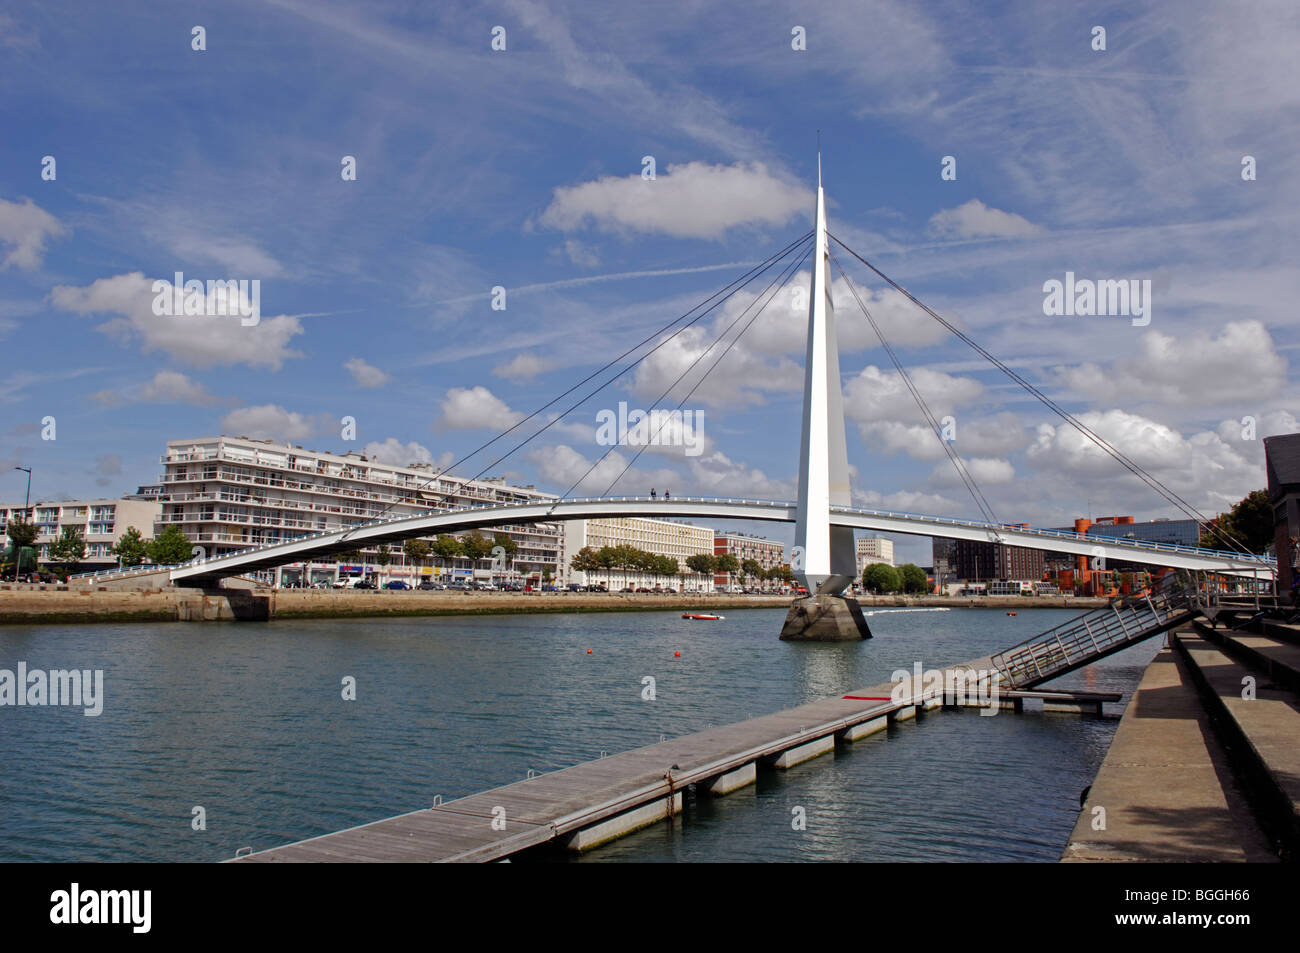 Footbridge spanning the Bassin du Commerce, Le Havre in the Seine Maritime (76) departement of France - Stock Image